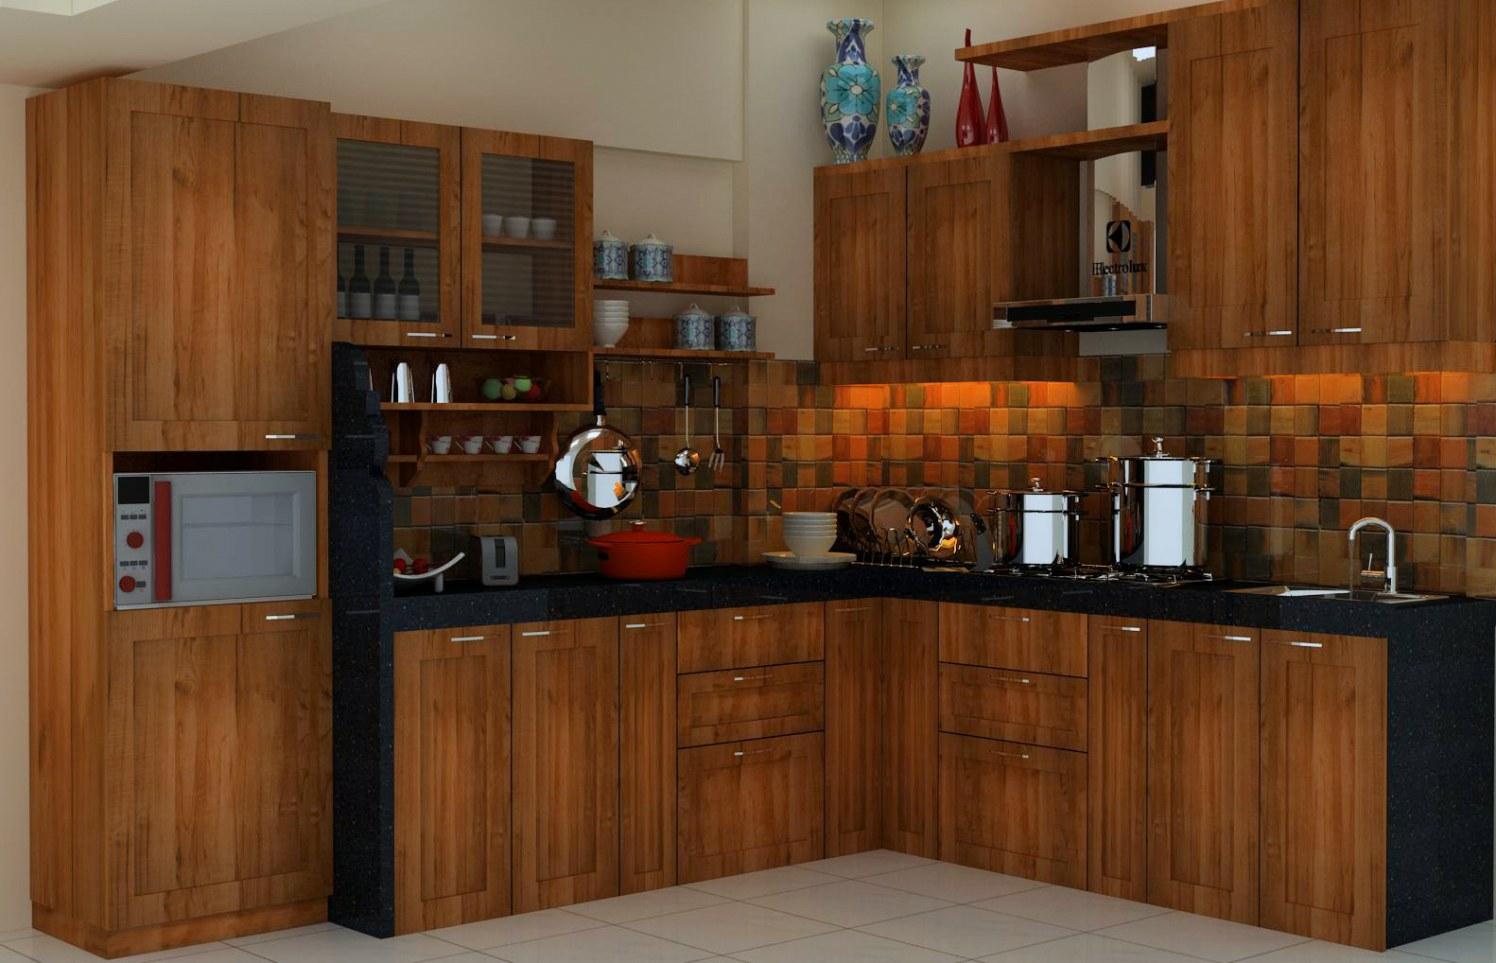 Modern wooden kitchen by Talha Naim Momin Contemporary | Interior Design Photos & Ideas